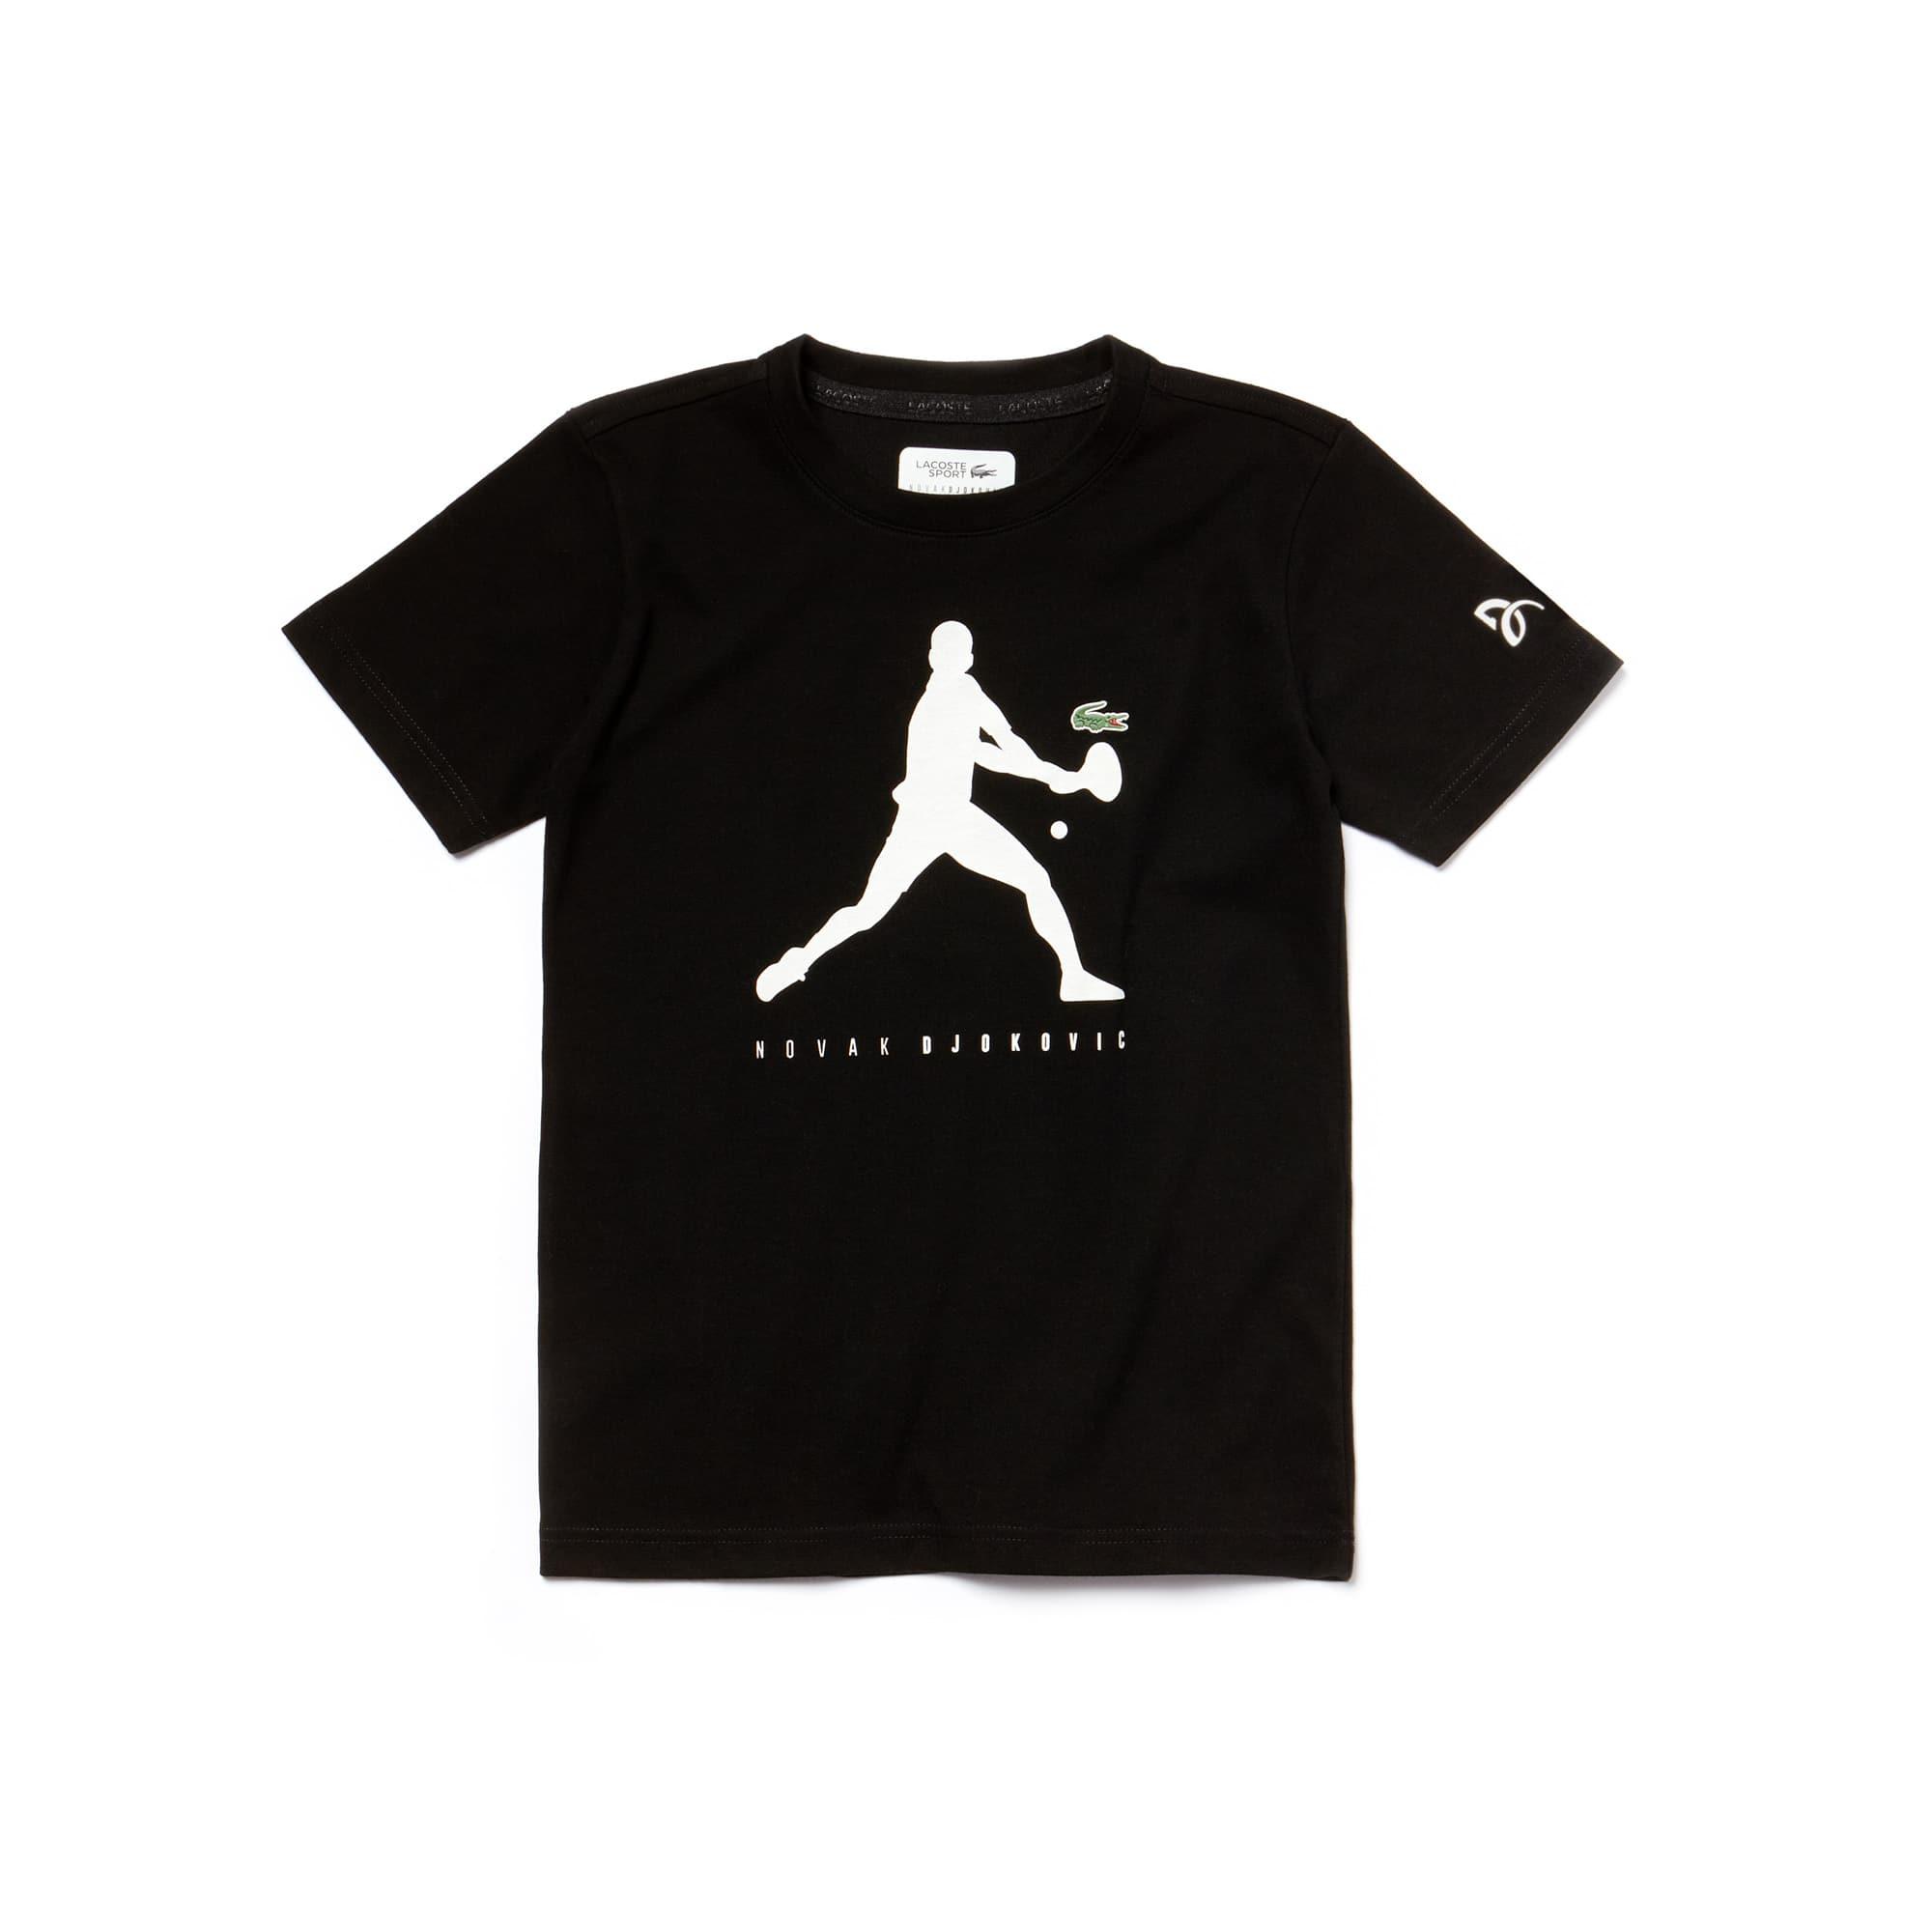 T-shirt Garçon Lacoste SPORT COLLECTION NOVAK DJOKOVIC SUPPORT WITH STYLE en jersey technique